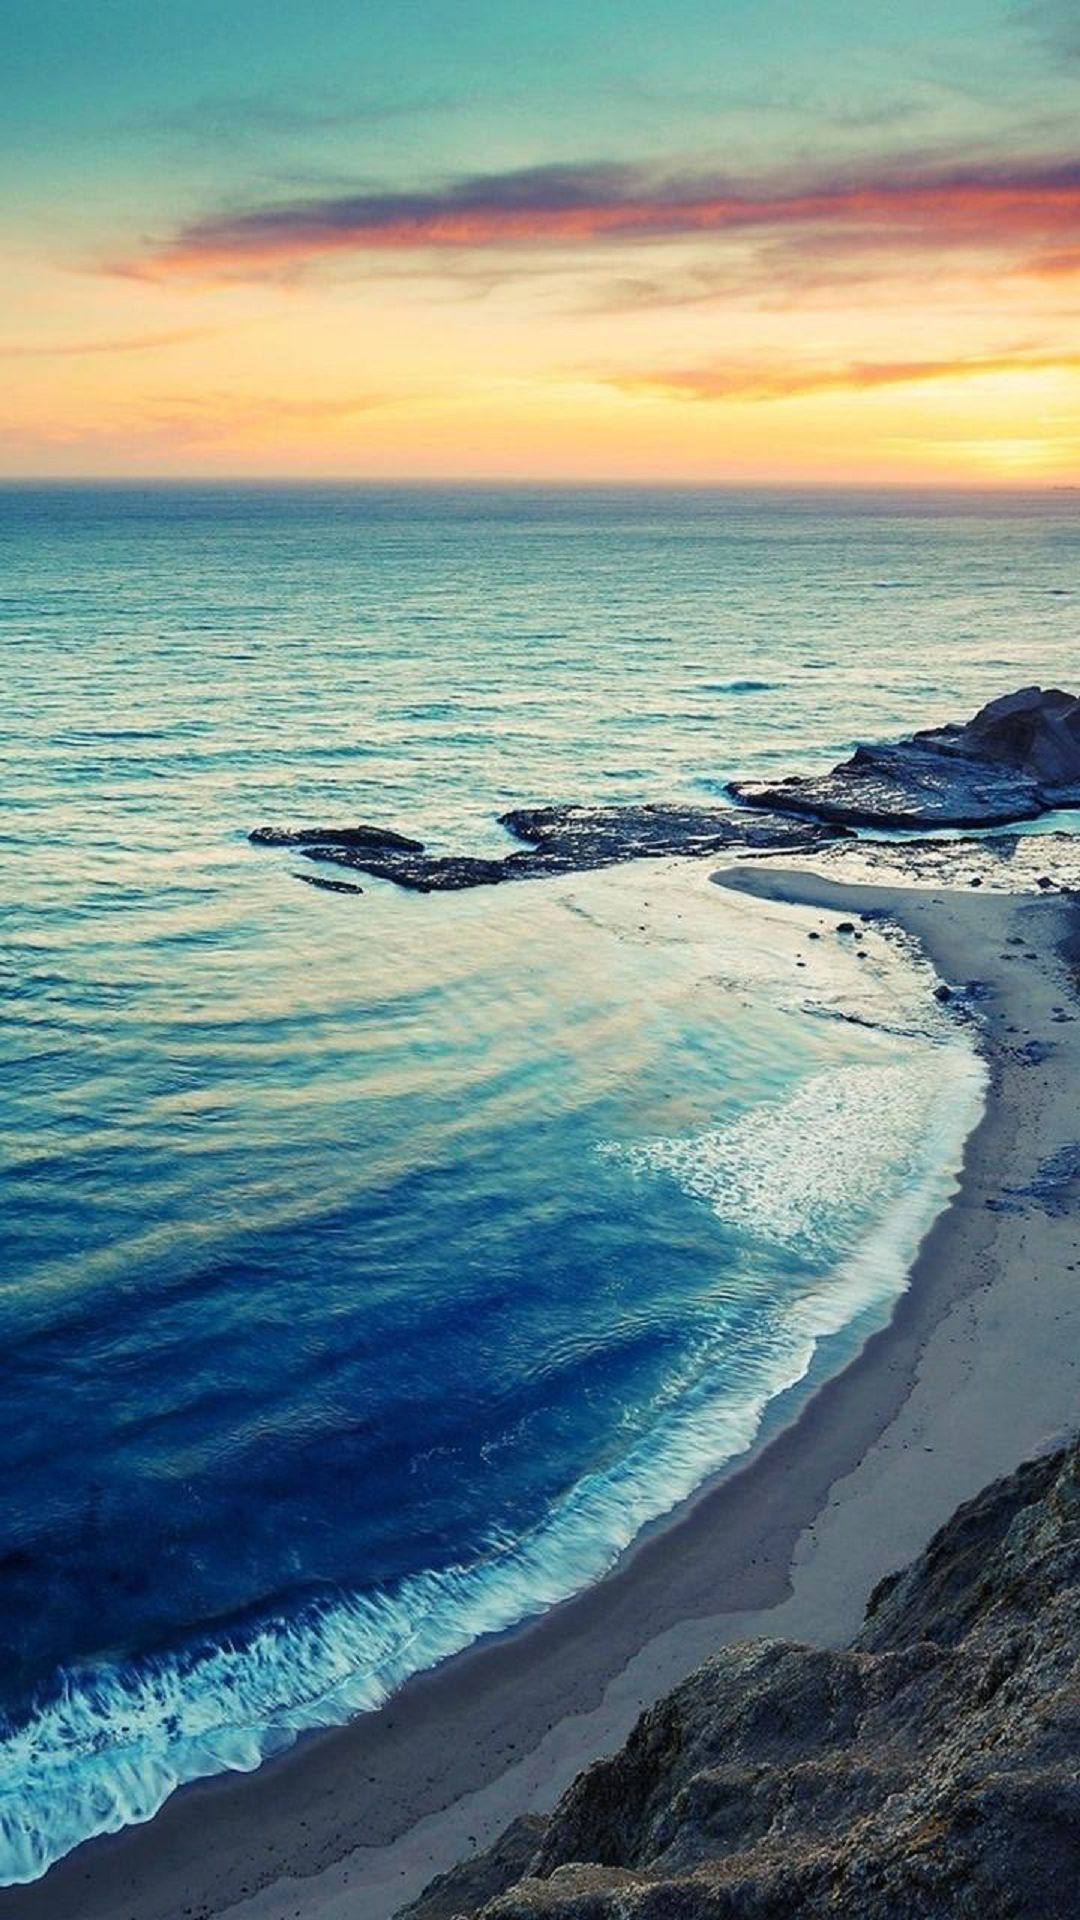 Sunrise Beach Seaside Coast Iphone 6 Plus Hd Wallpaper Tapety